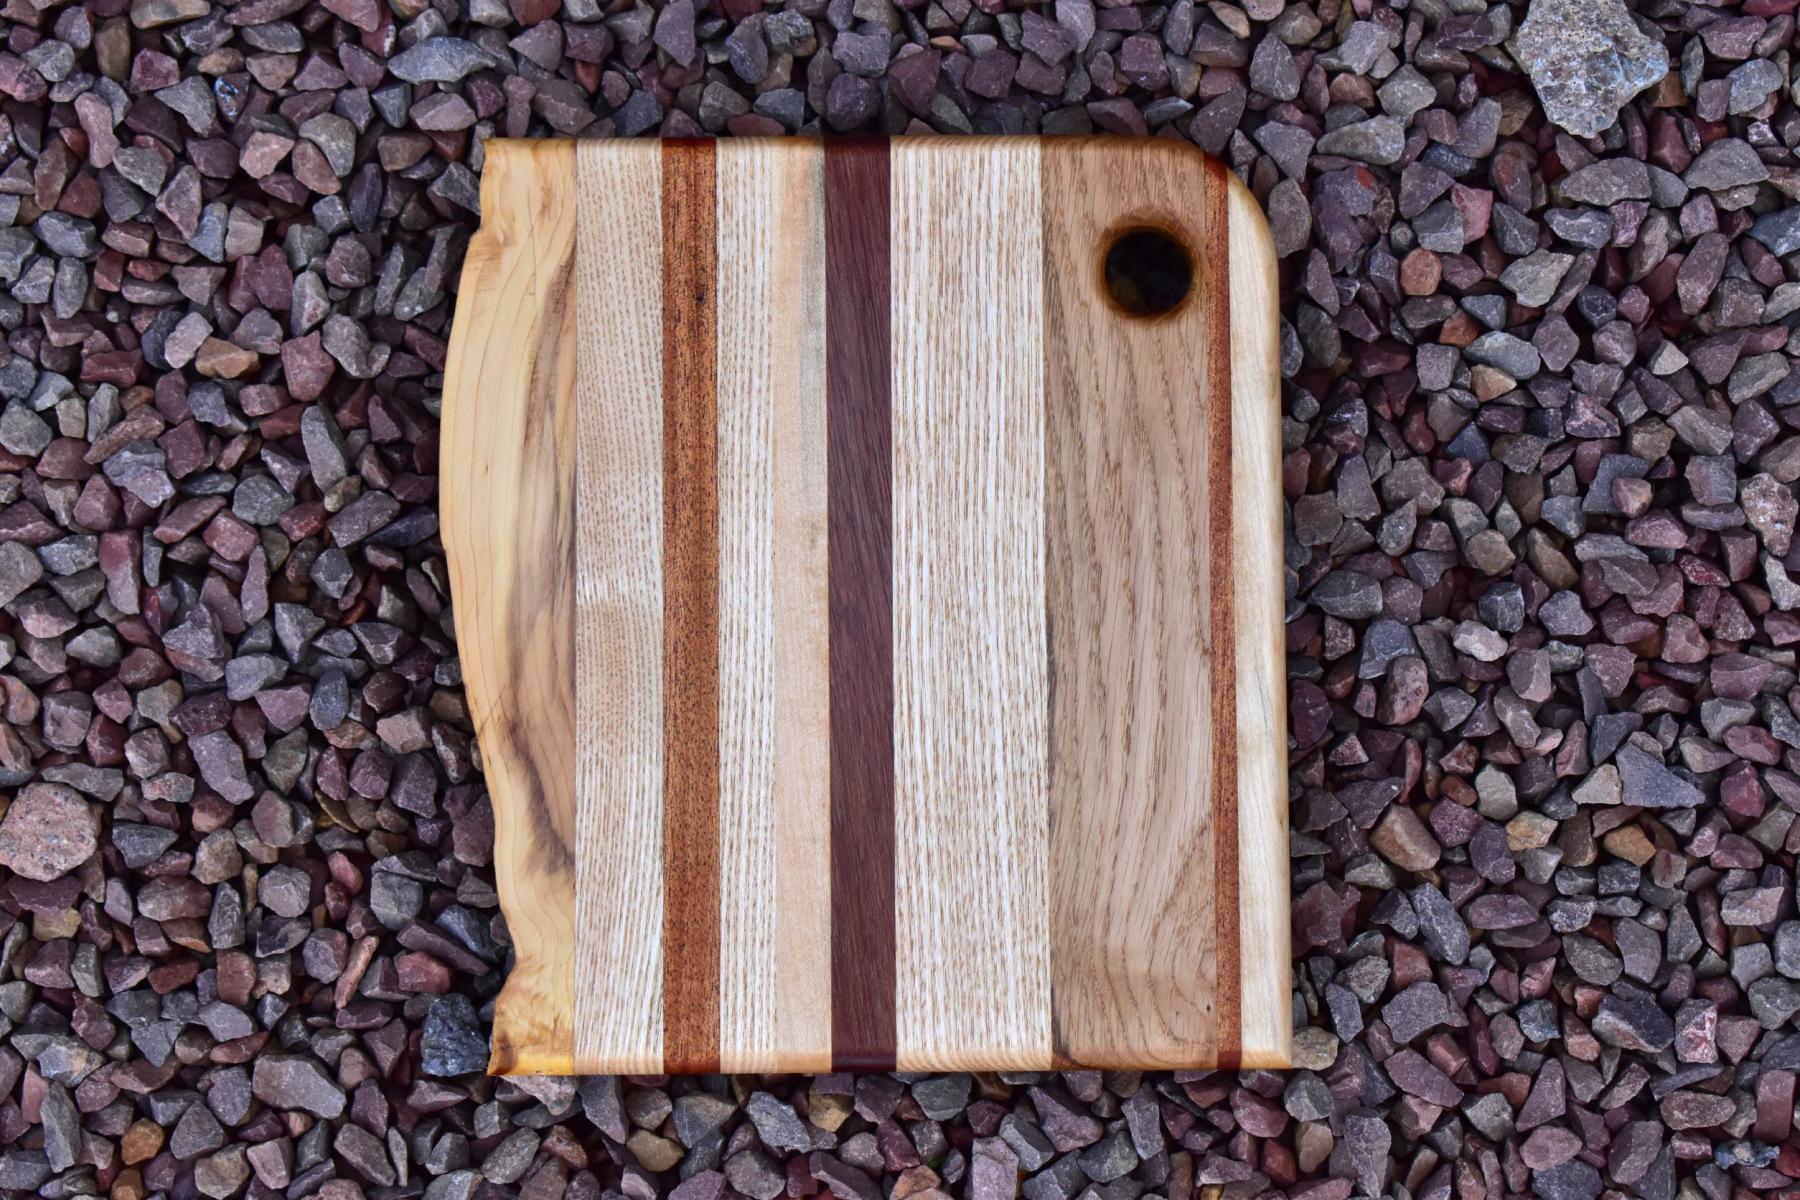 Mixed wood charcuterie board